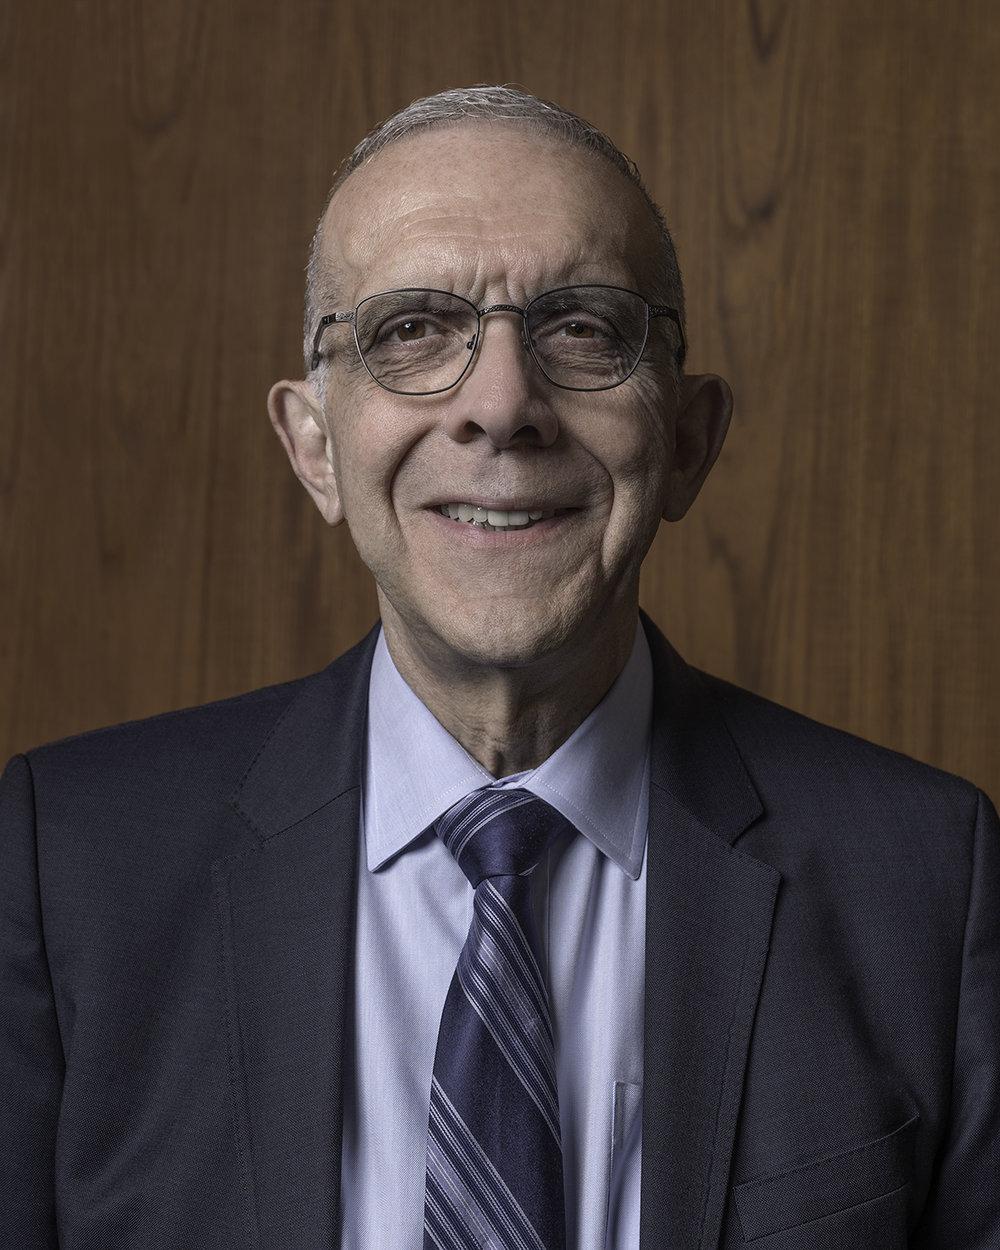 Frank Marrocco